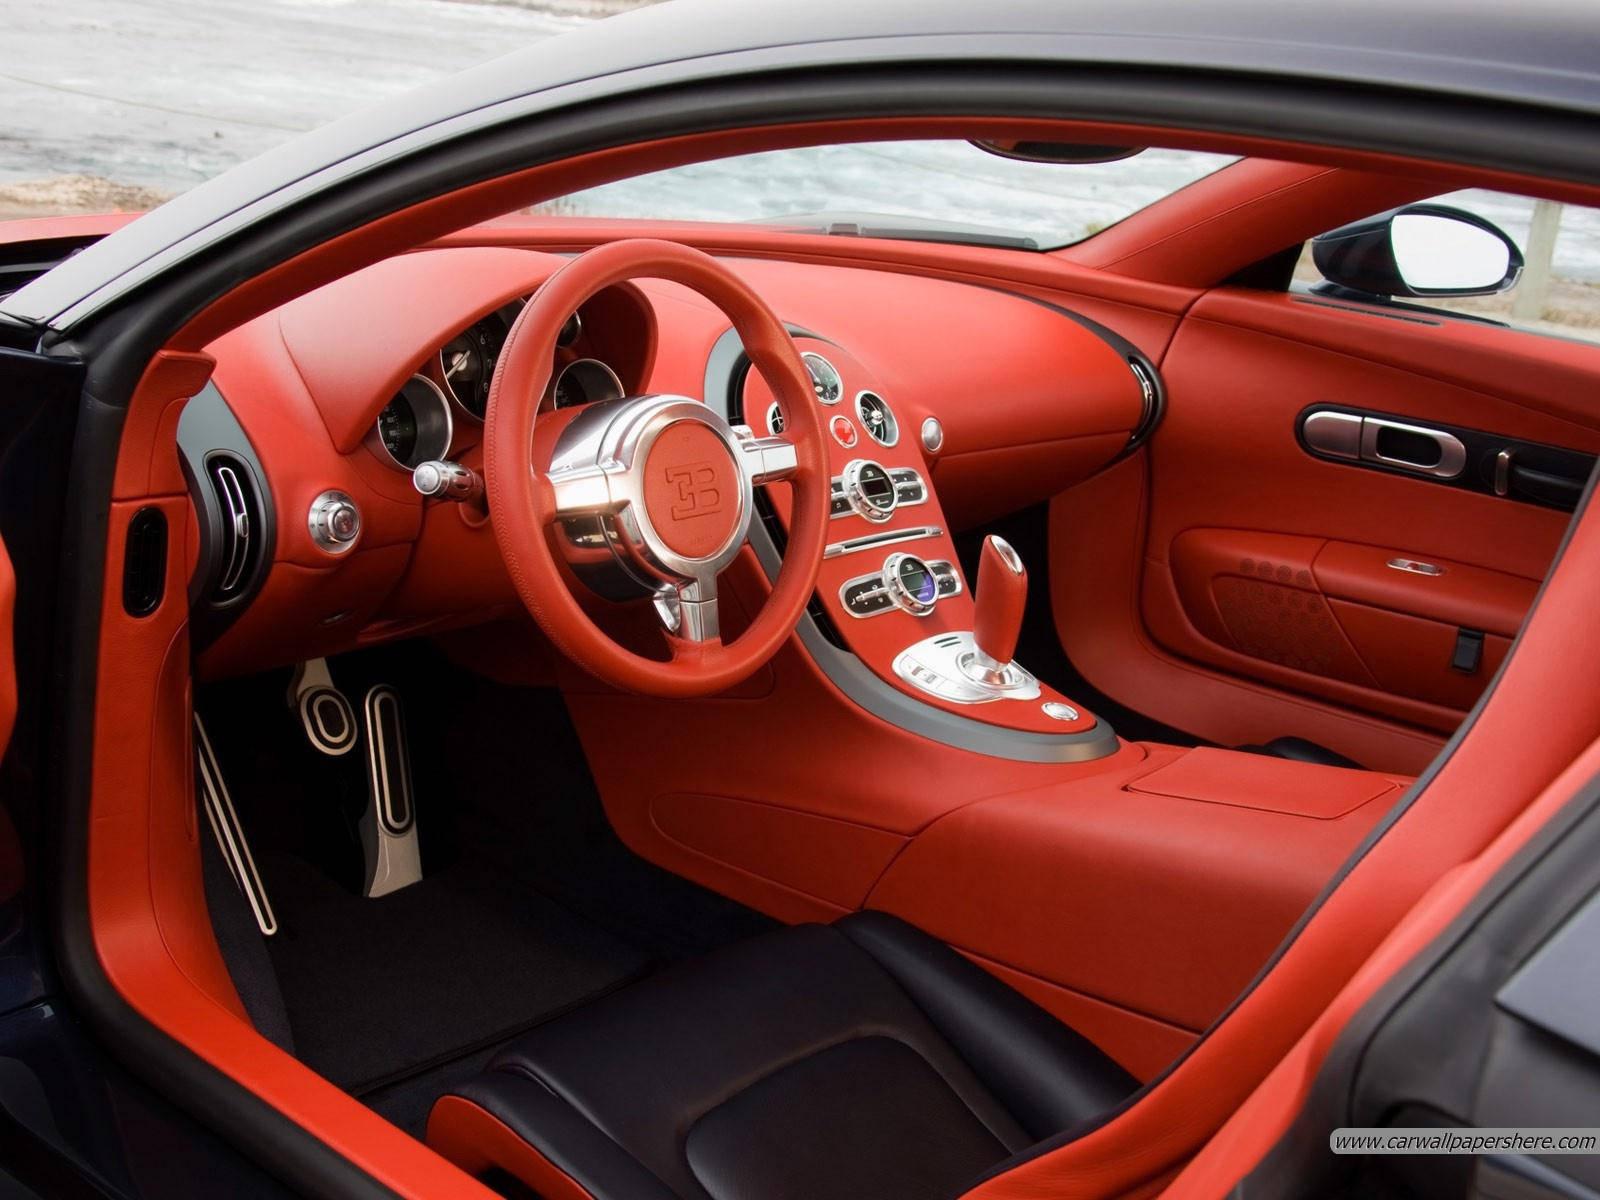 red salon, красная кожа, салон, Bugatti, car, wallpaper, скачать фото обои на рабочий стол